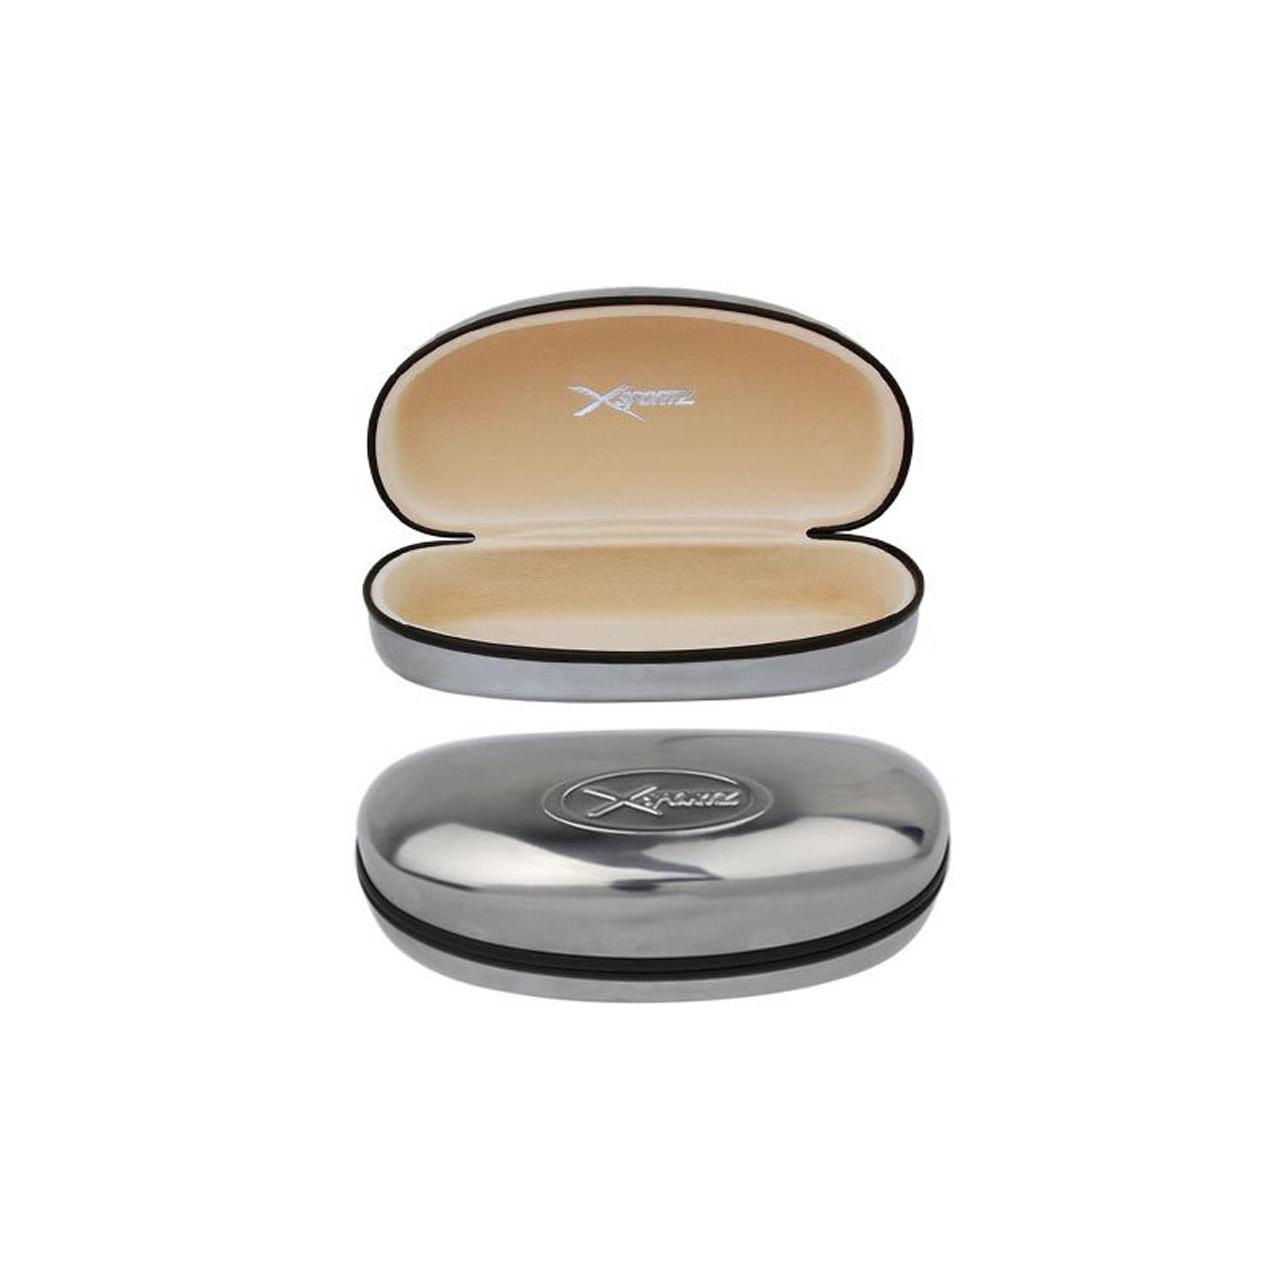 Xsportz Sunglass Case | Hard Cases